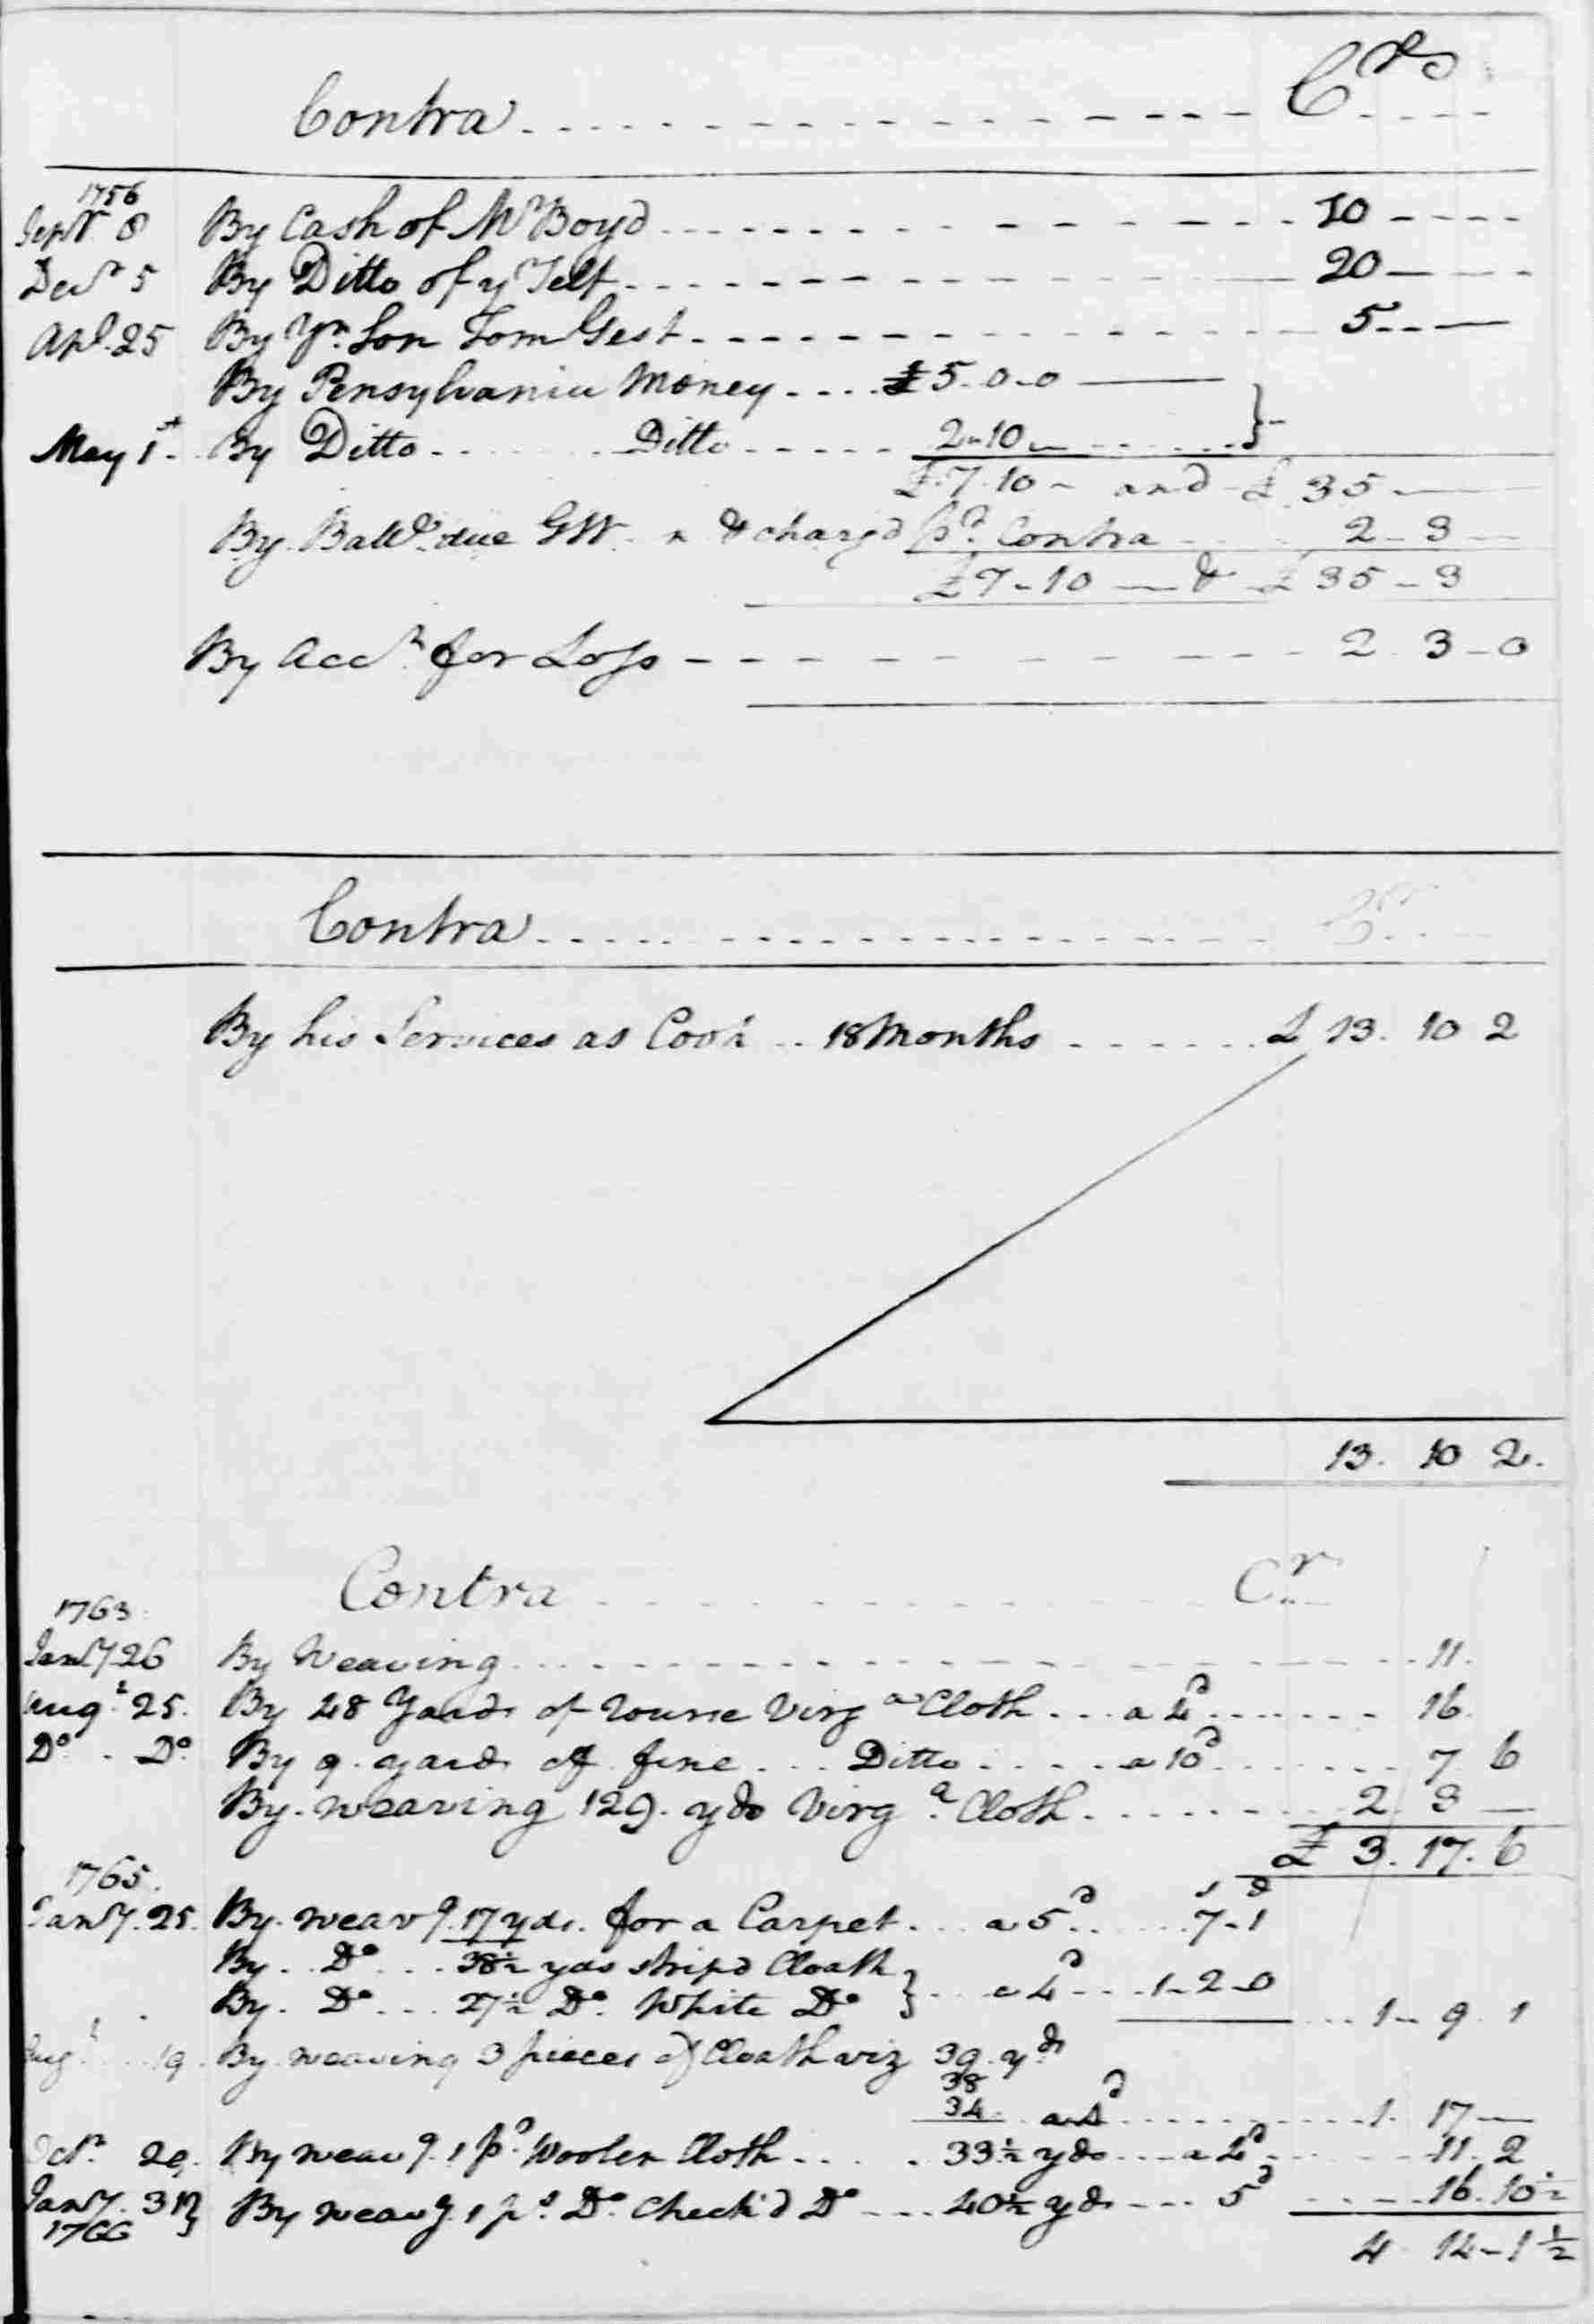 Ledger A, folio 42, right side